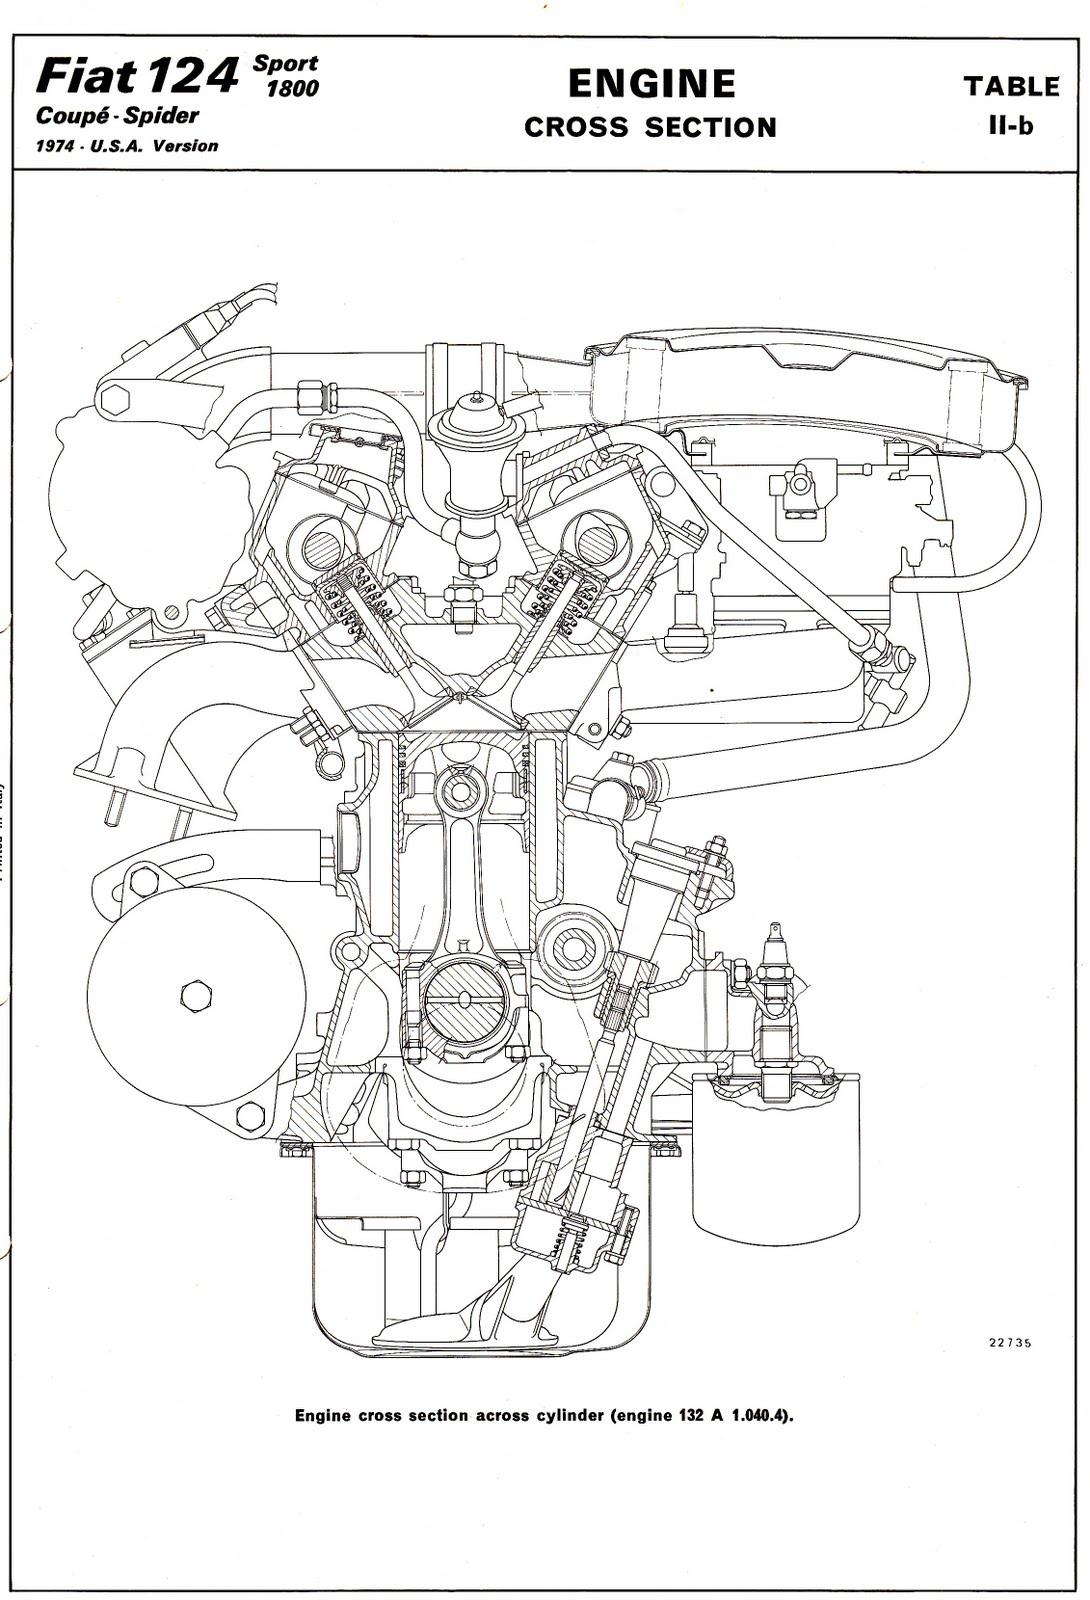 medium resolution of fiat 500 engine diagram simple wiring diagram rh 48 mara cujas de 79 fiat spyder engine